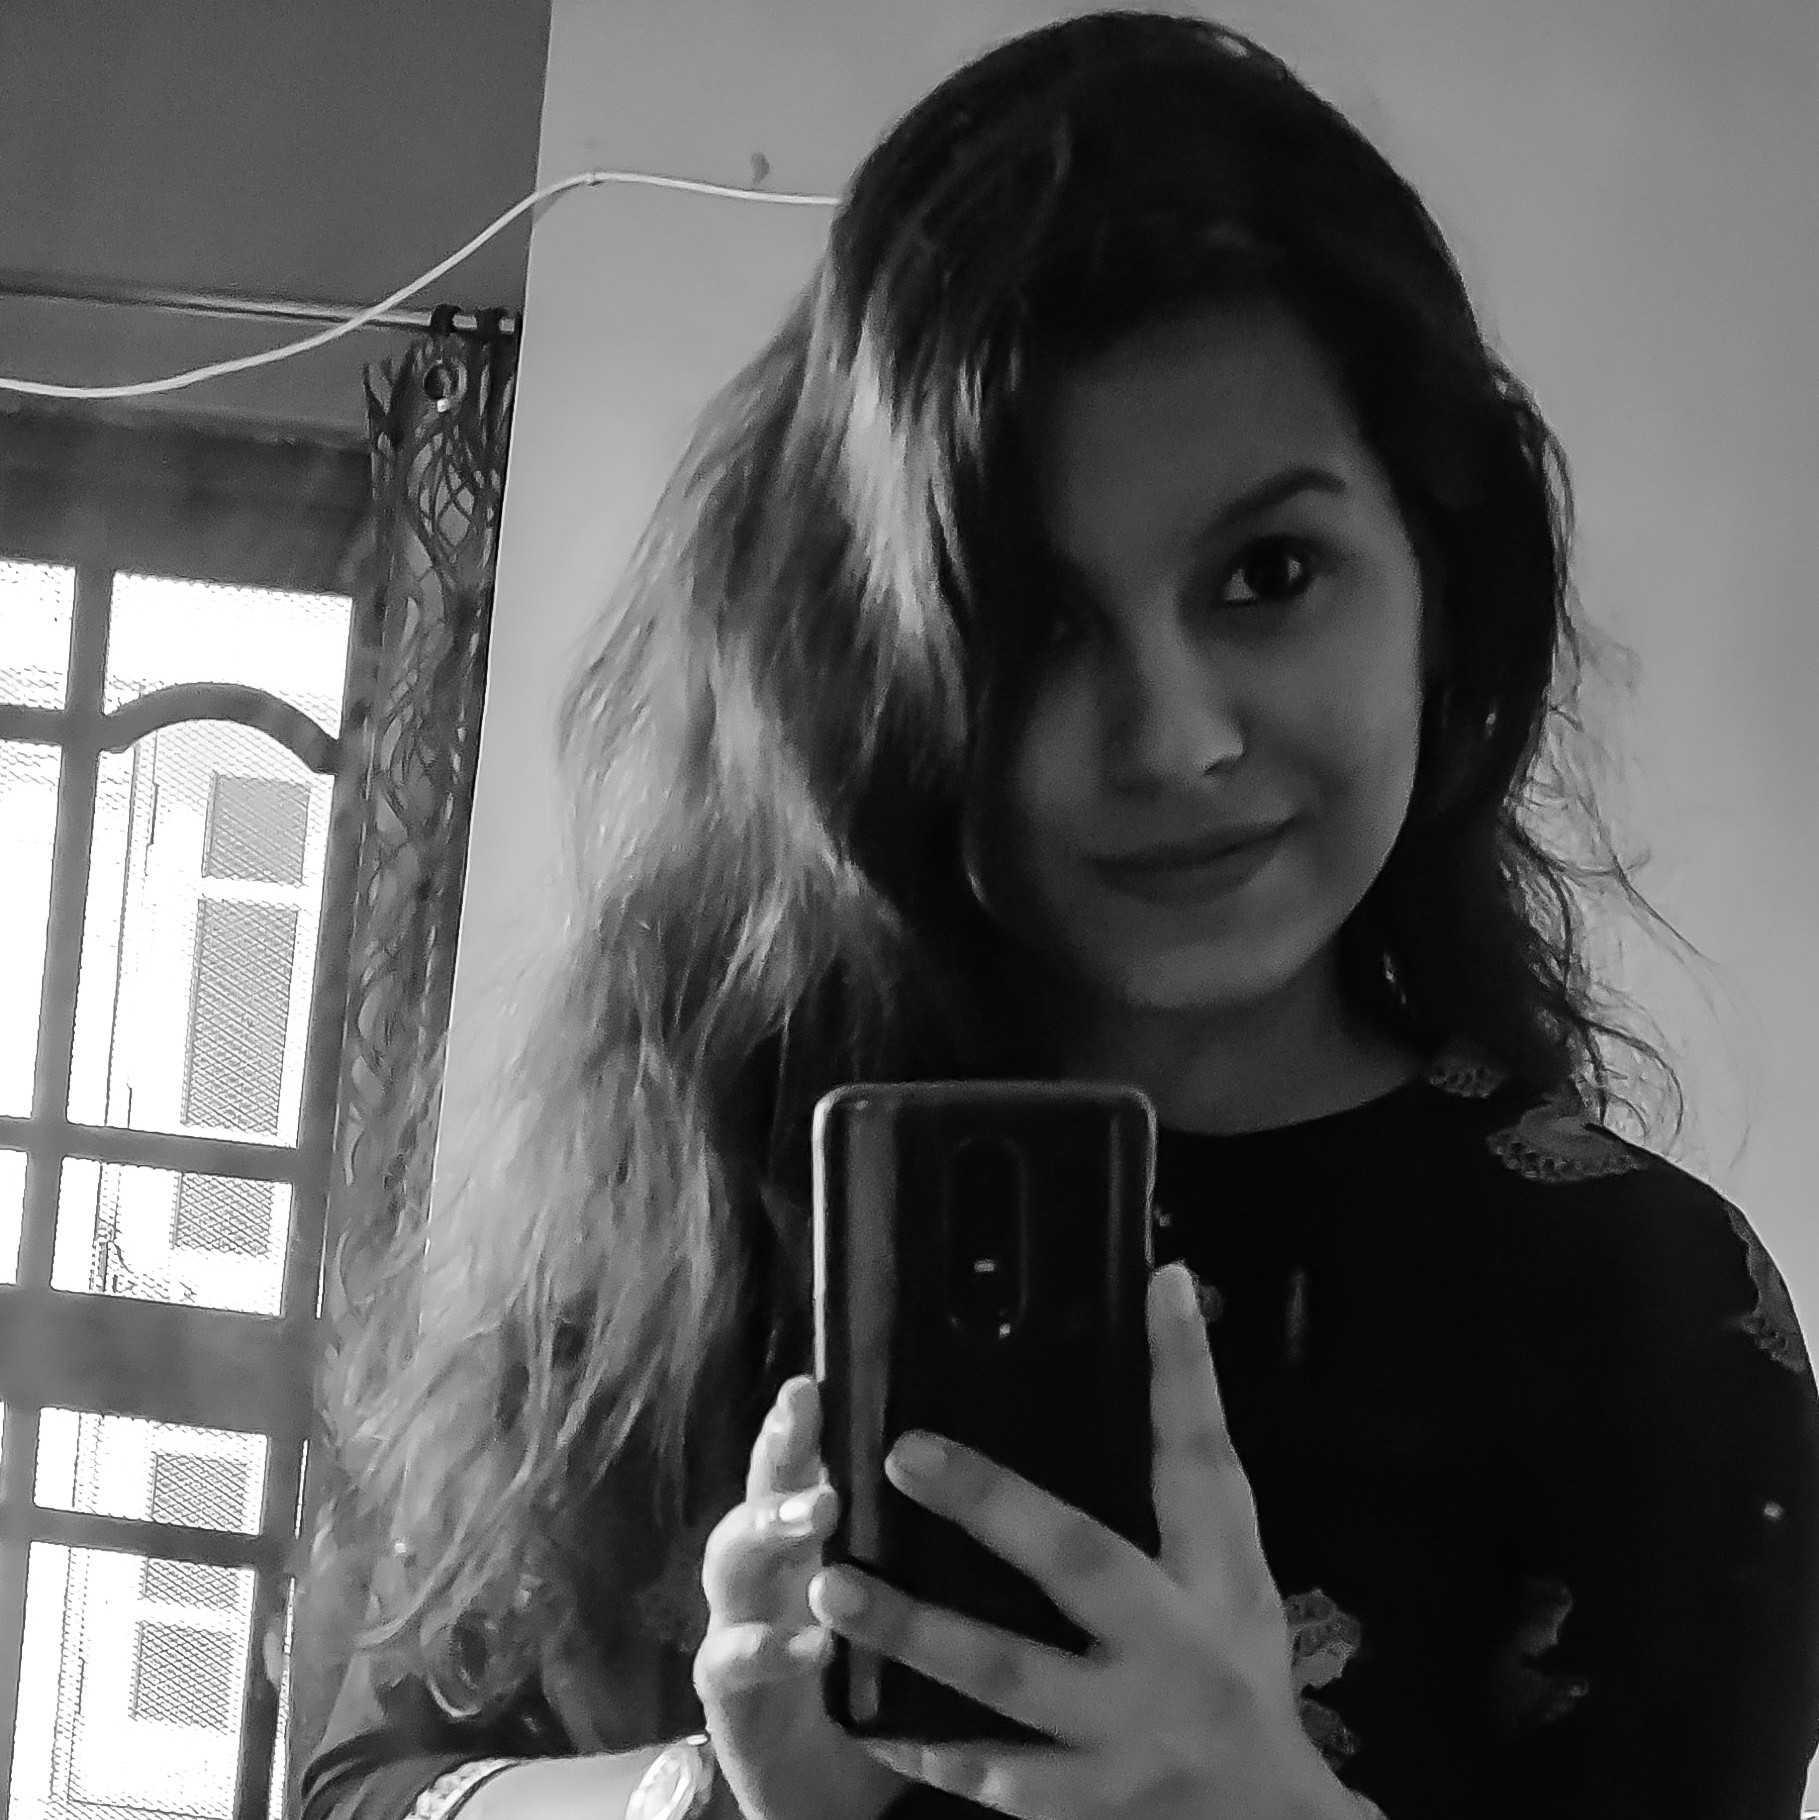 Subhashini Rana Insta - @abigparadox शायराना दिल 🖤